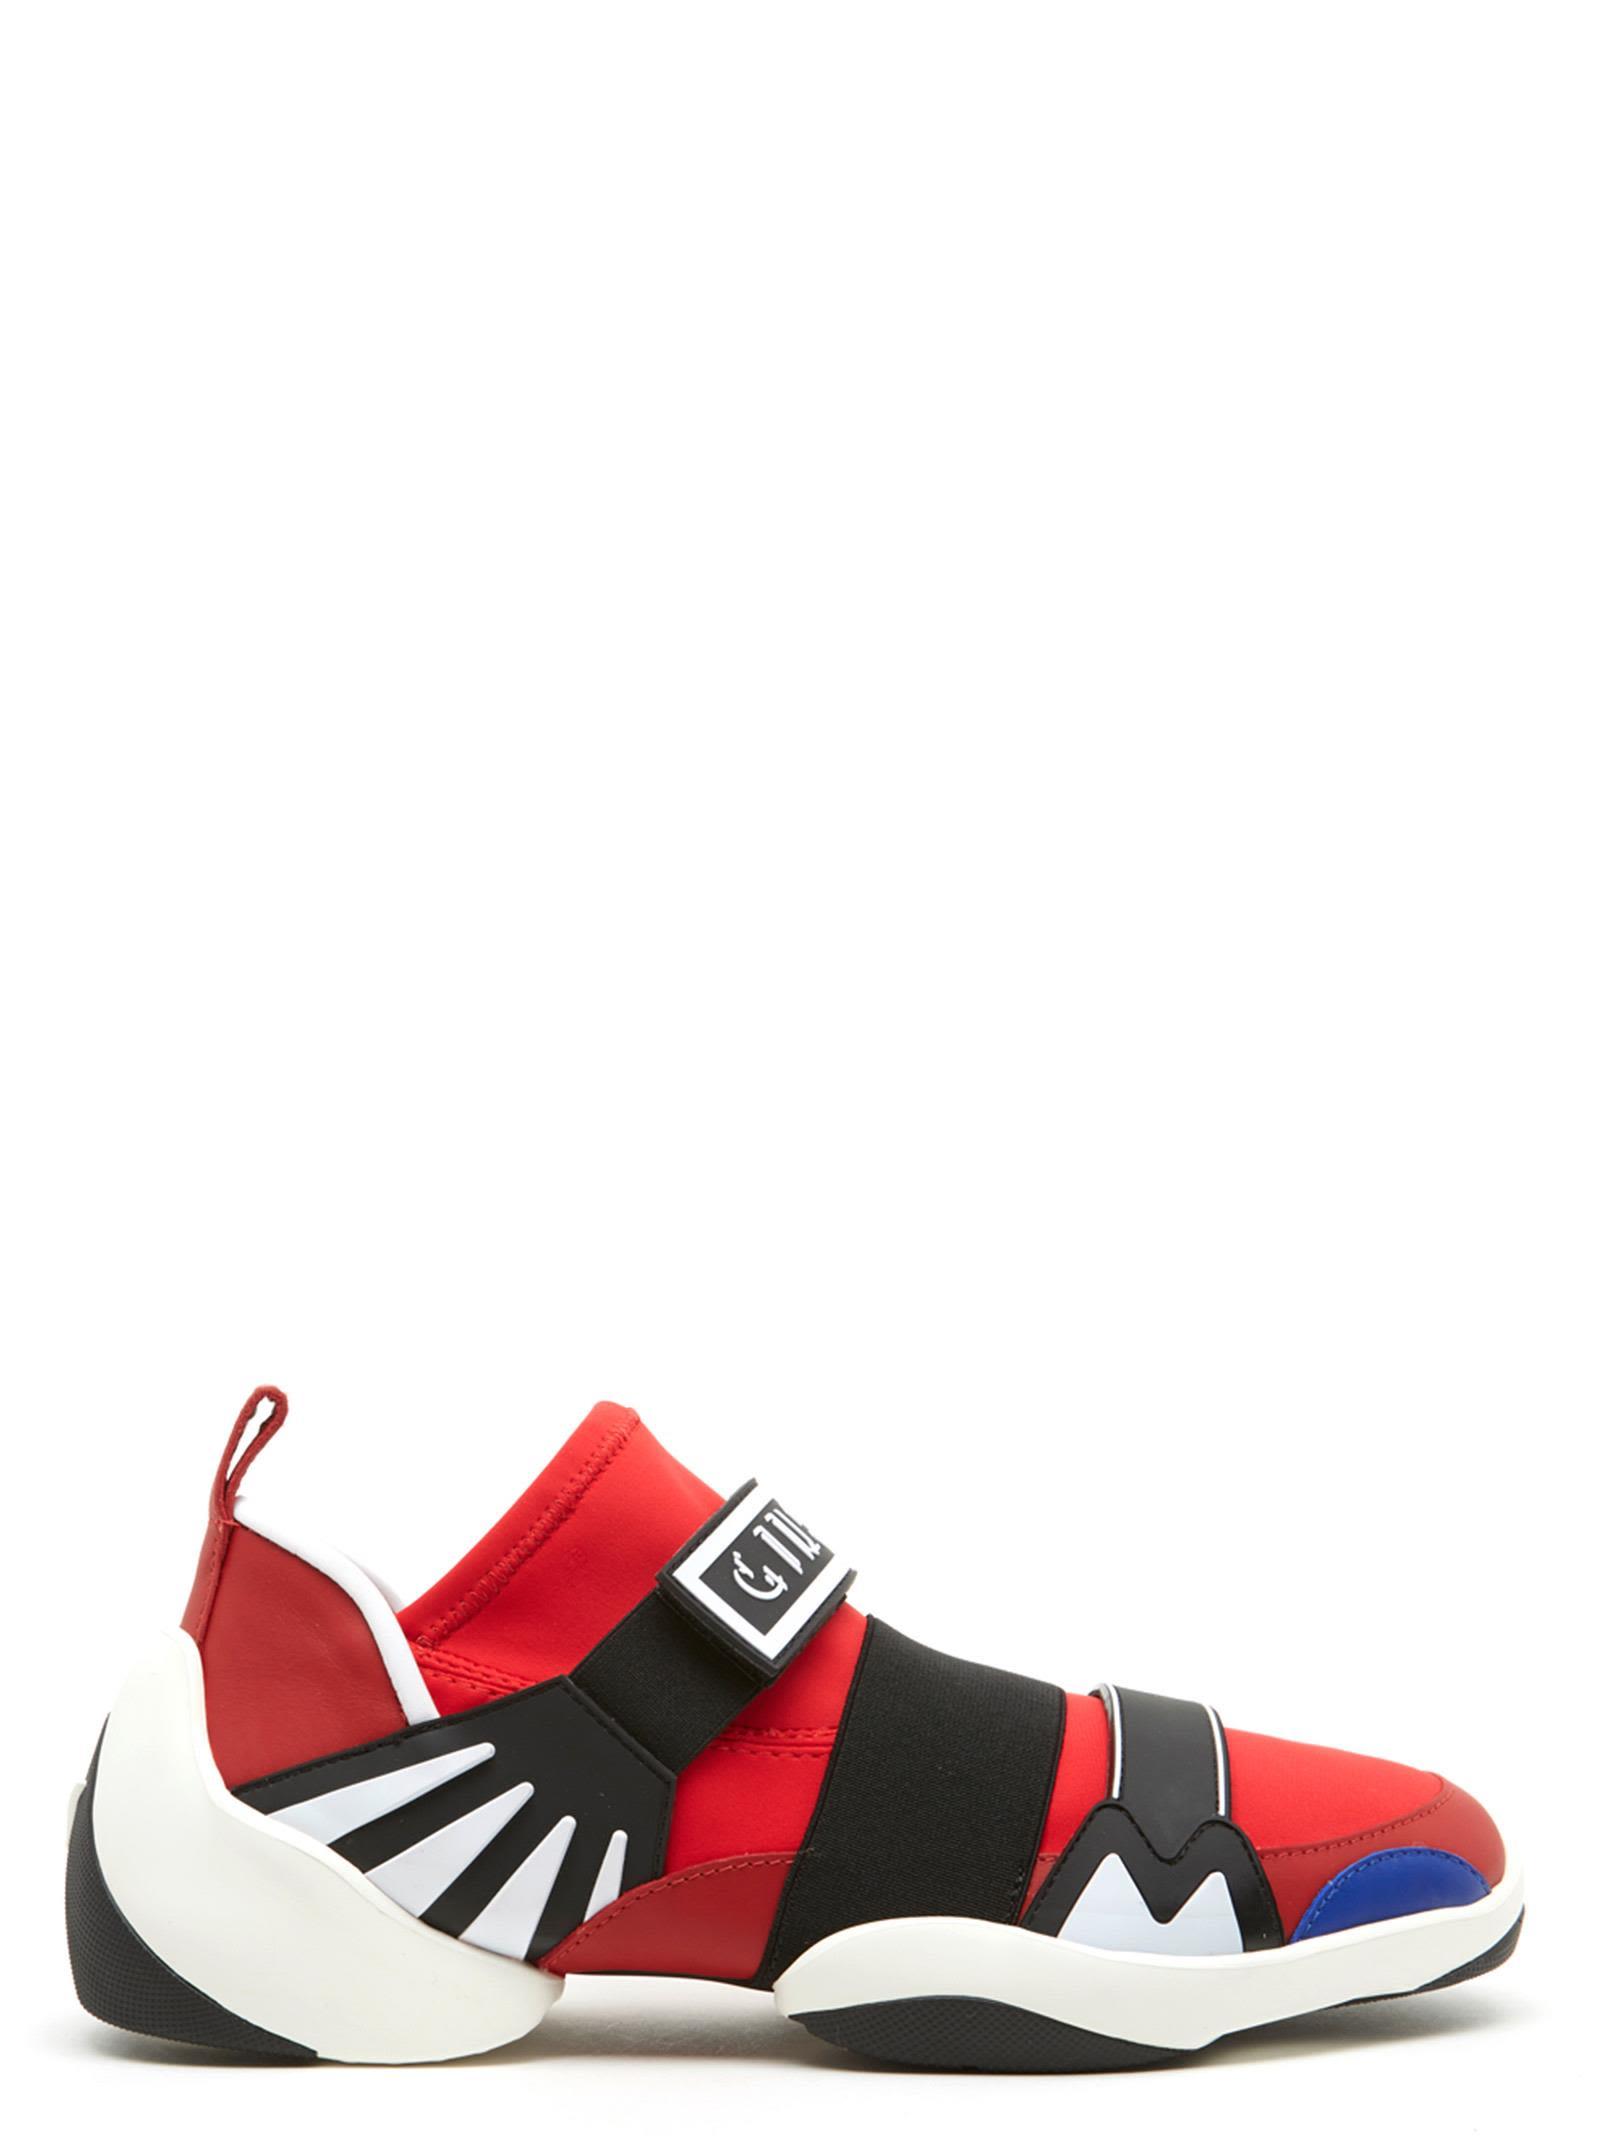 Giuseppe Zanotti 'light Jump' Shoes